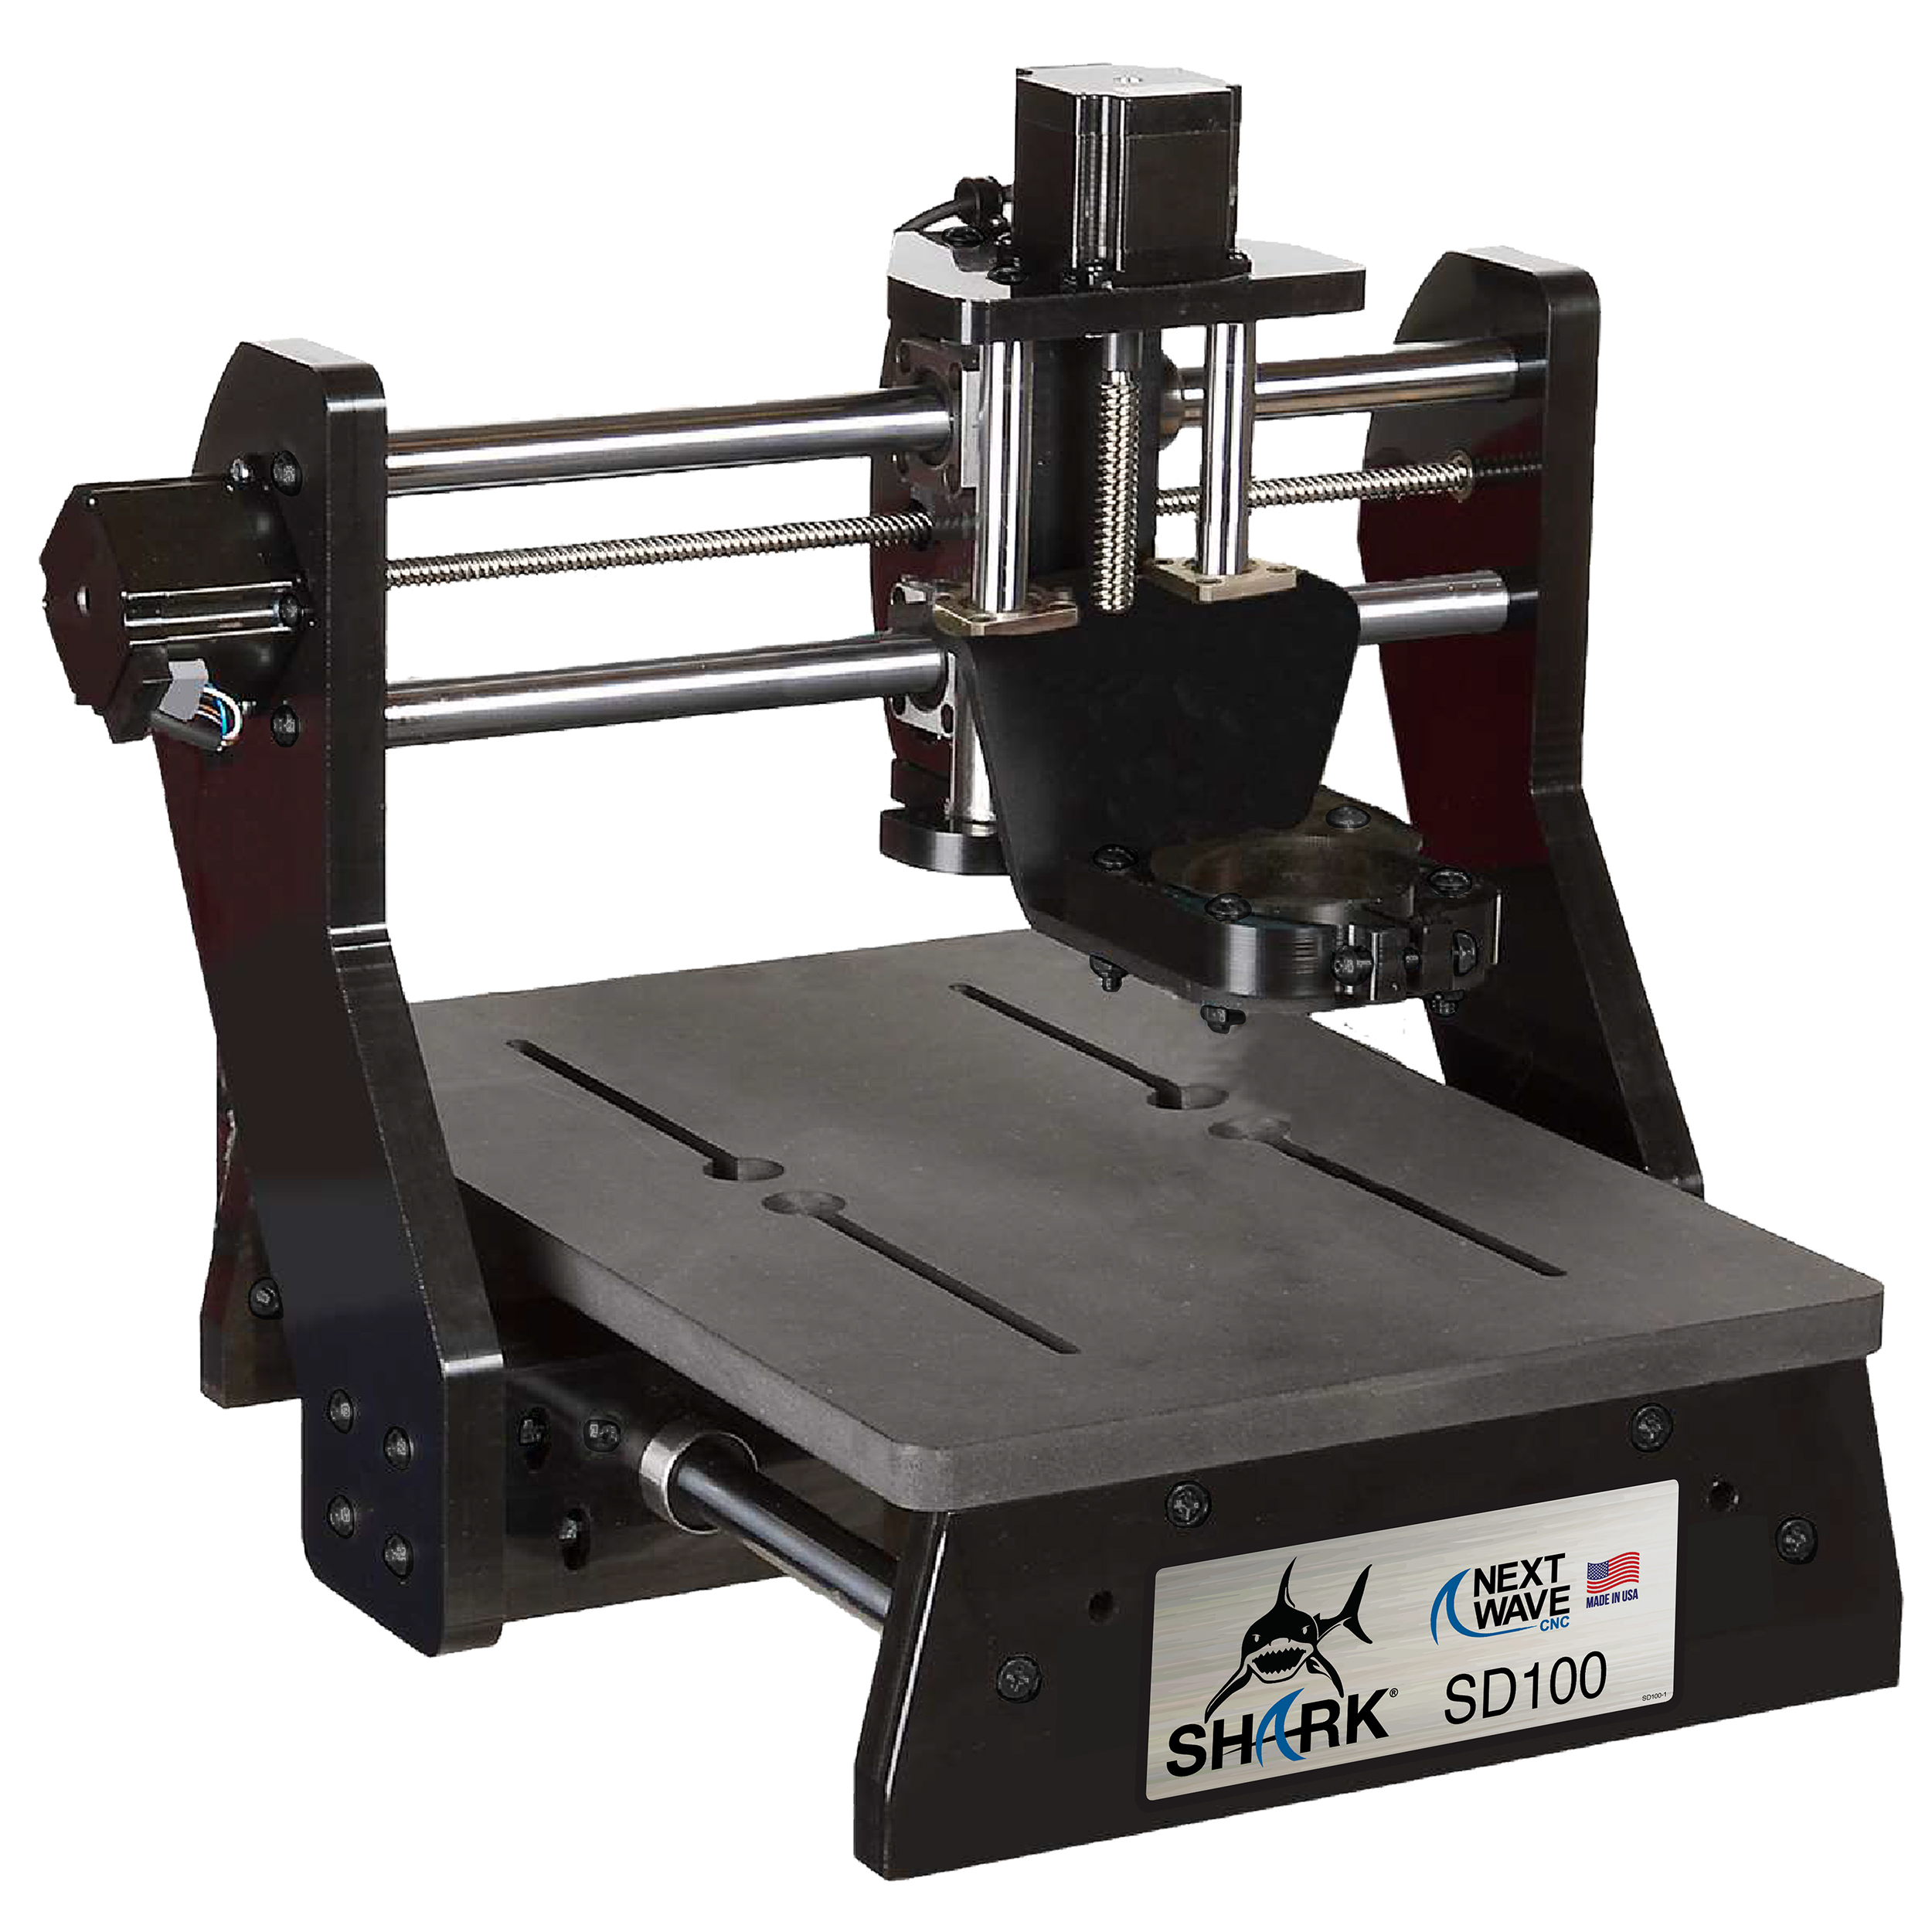 SHARK SD100 CNC Machine